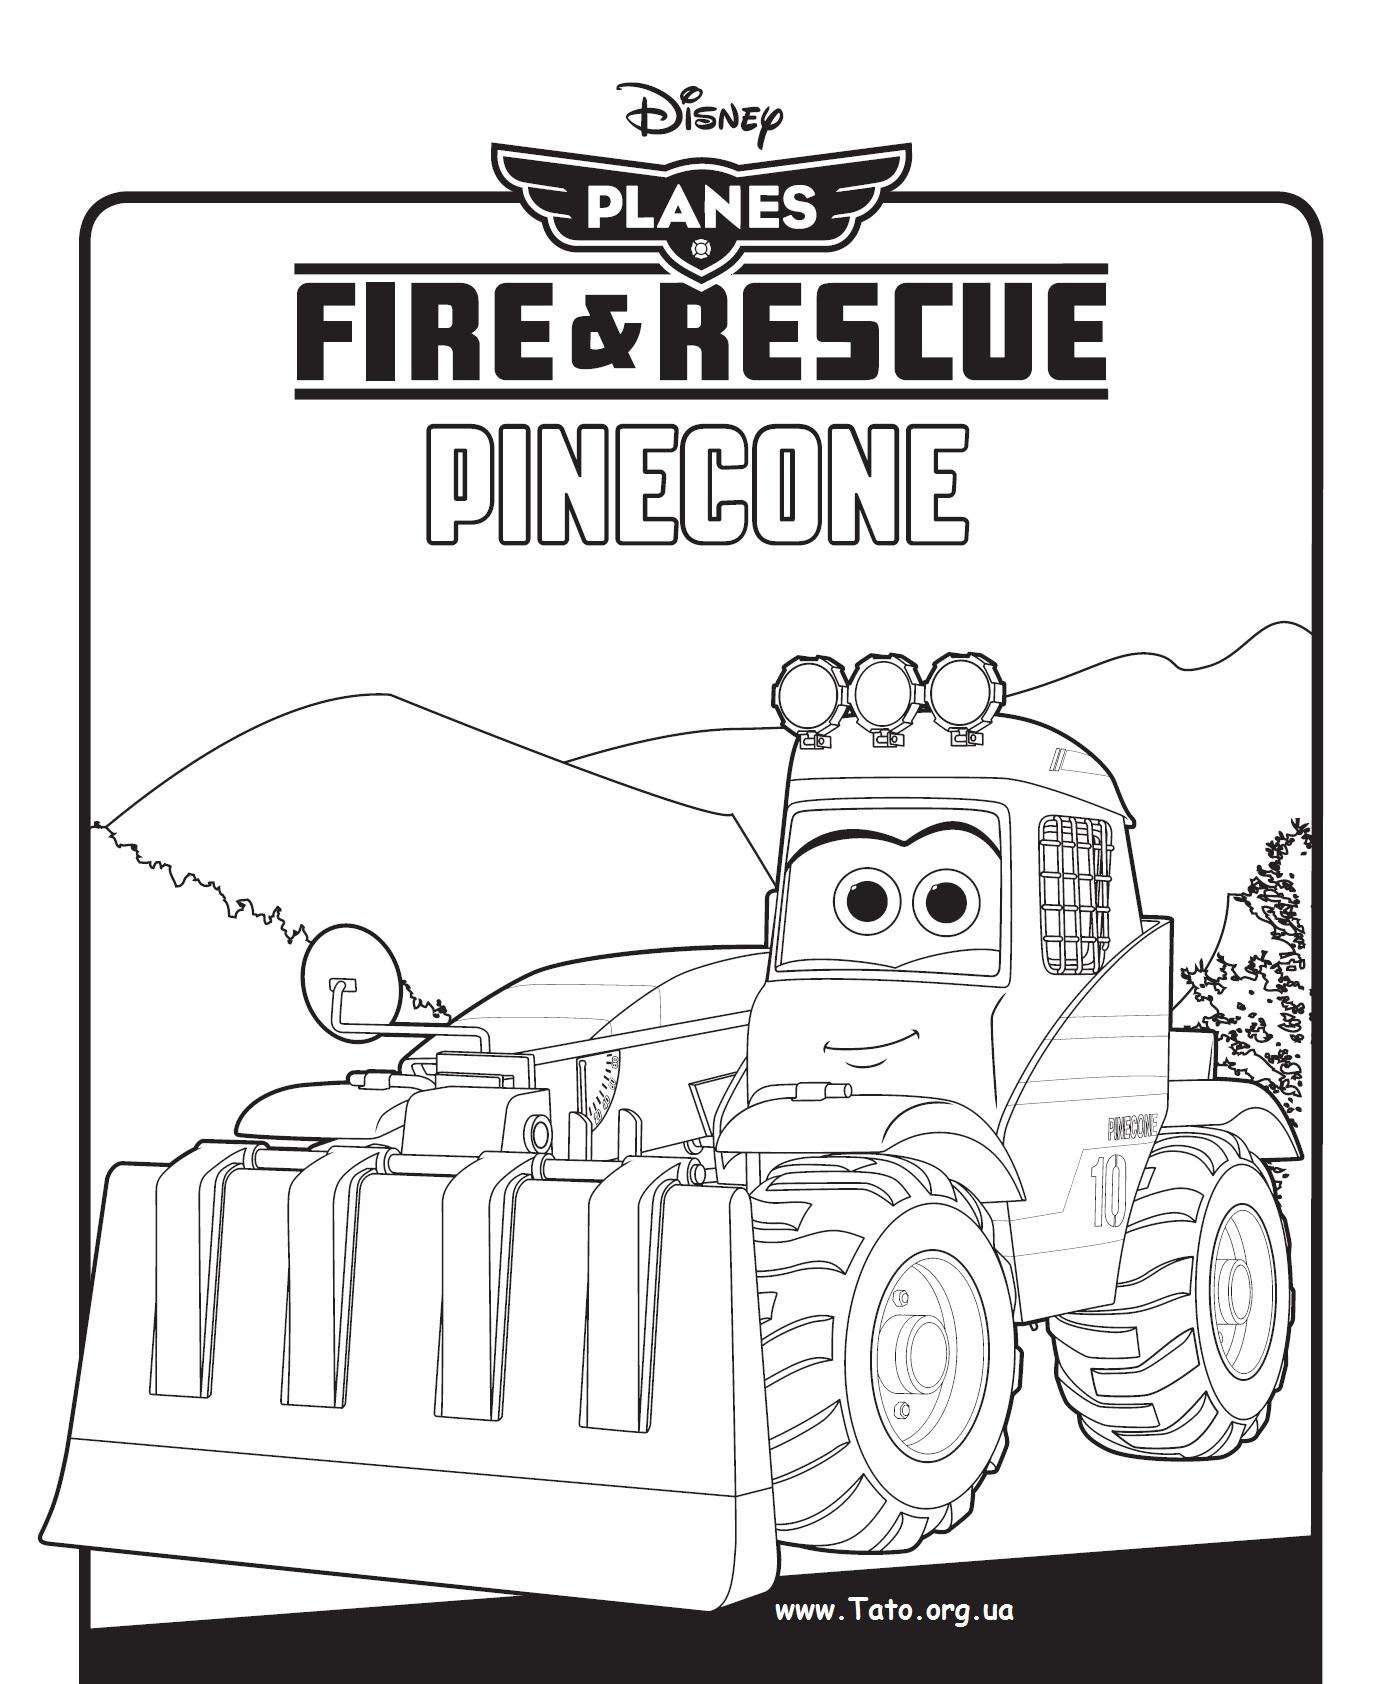 Pineconetatoorgua